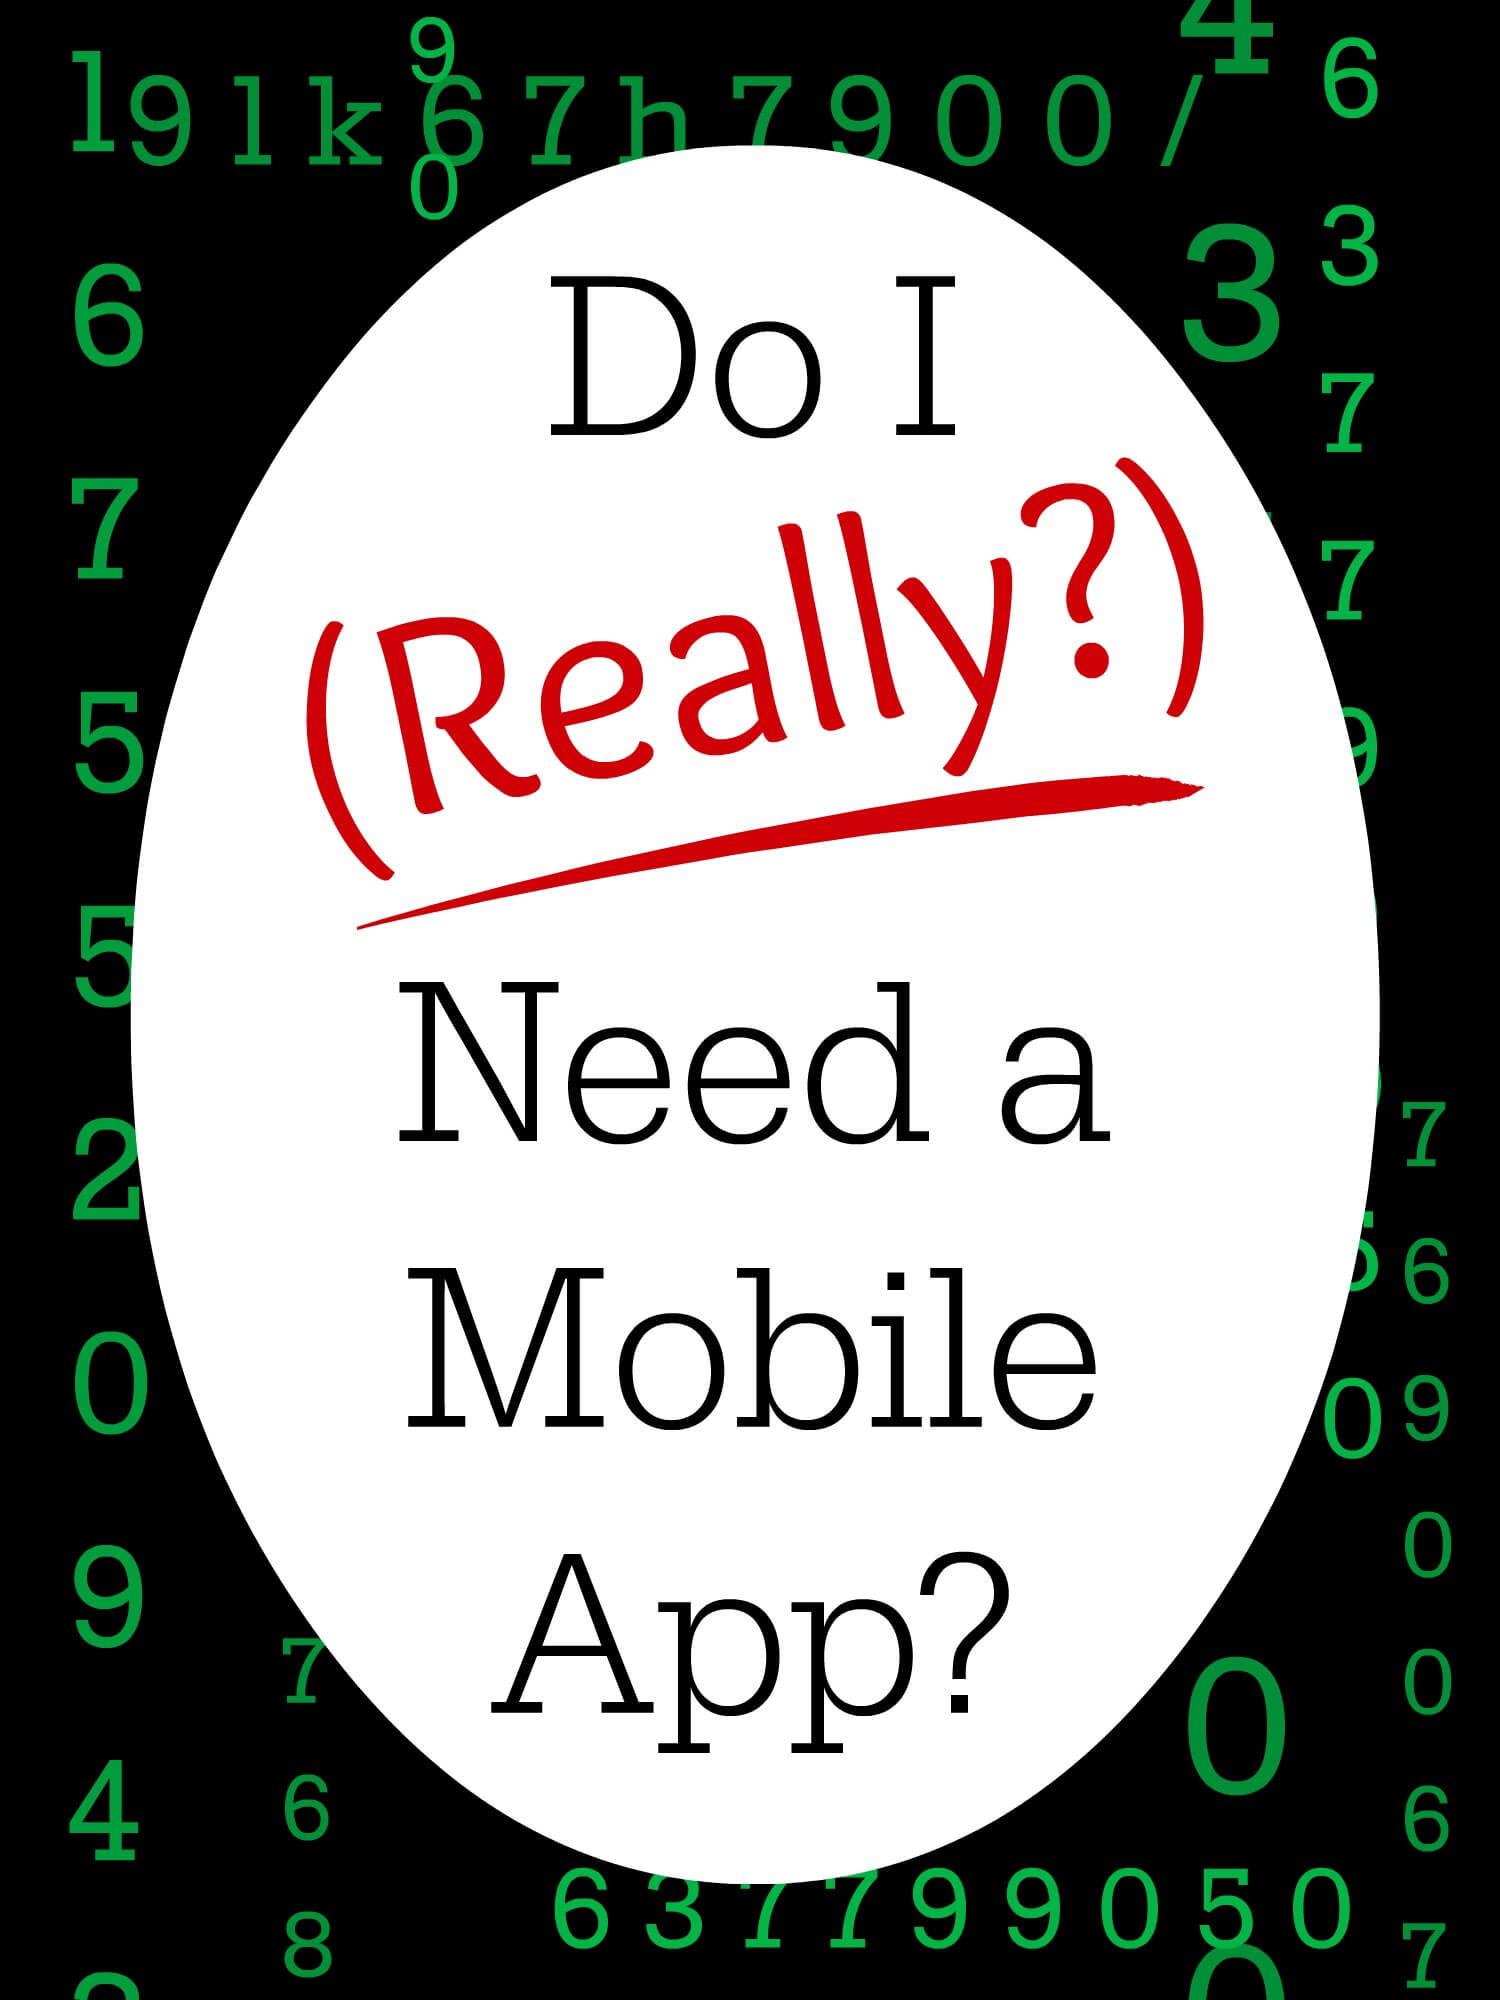 do i really need a mobile app